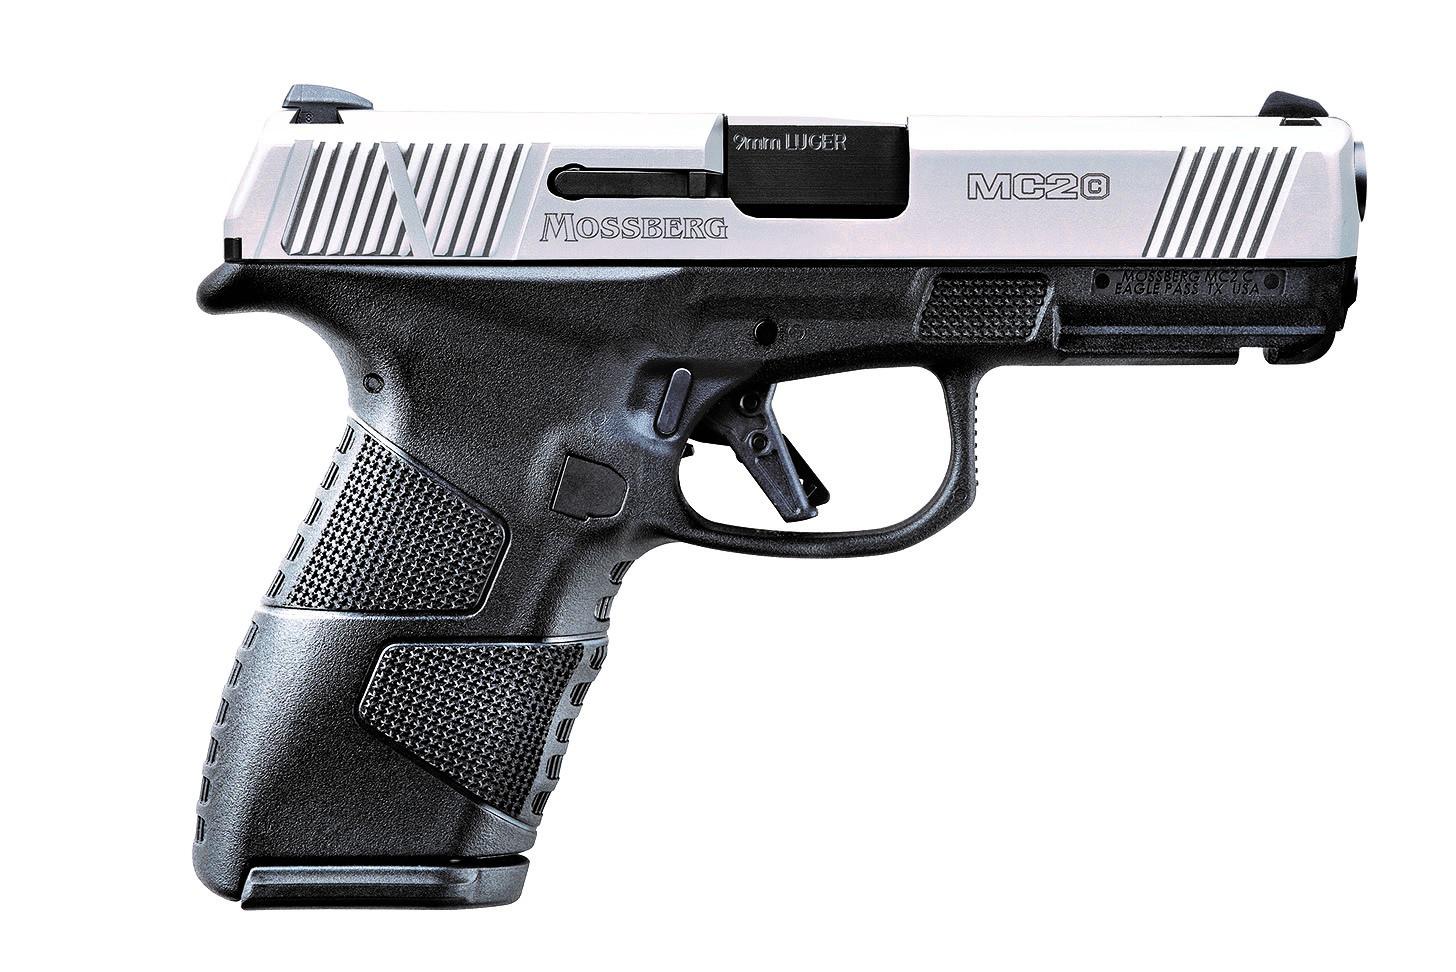 "Mossberg MC2c Compact 3.9"" Two-Tone CBS 9x19 - halbautomatische Pistole"